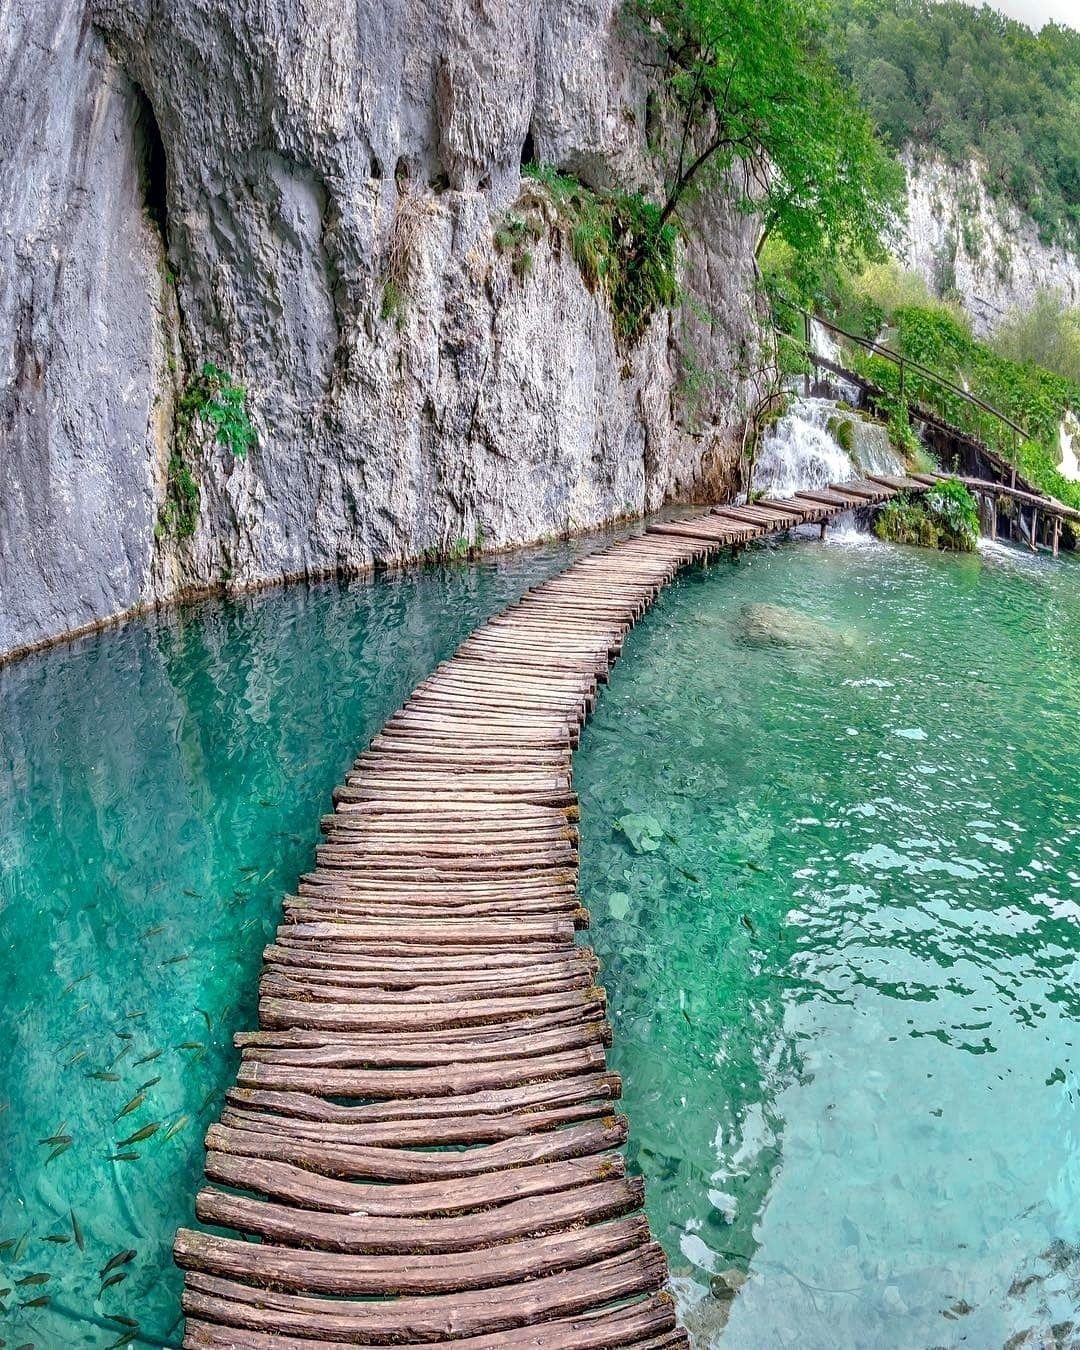 حديقة بليتفيتش كرواتيا Vakre Steder Voyage Instagram